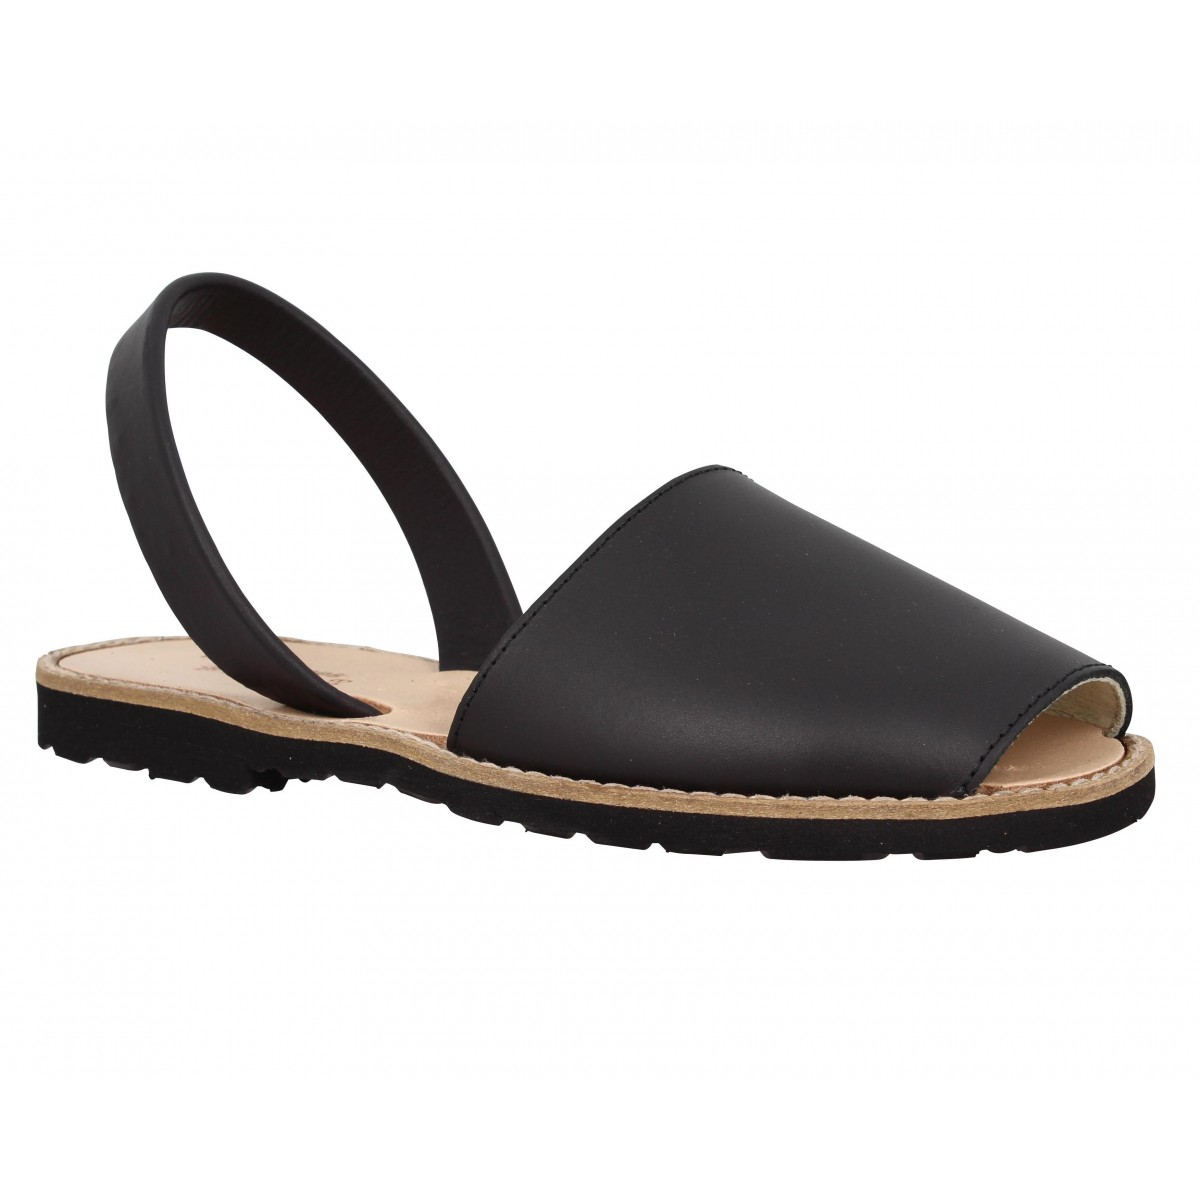 Nu-pieds MINORQUINES Avarca cuir Femme Noir